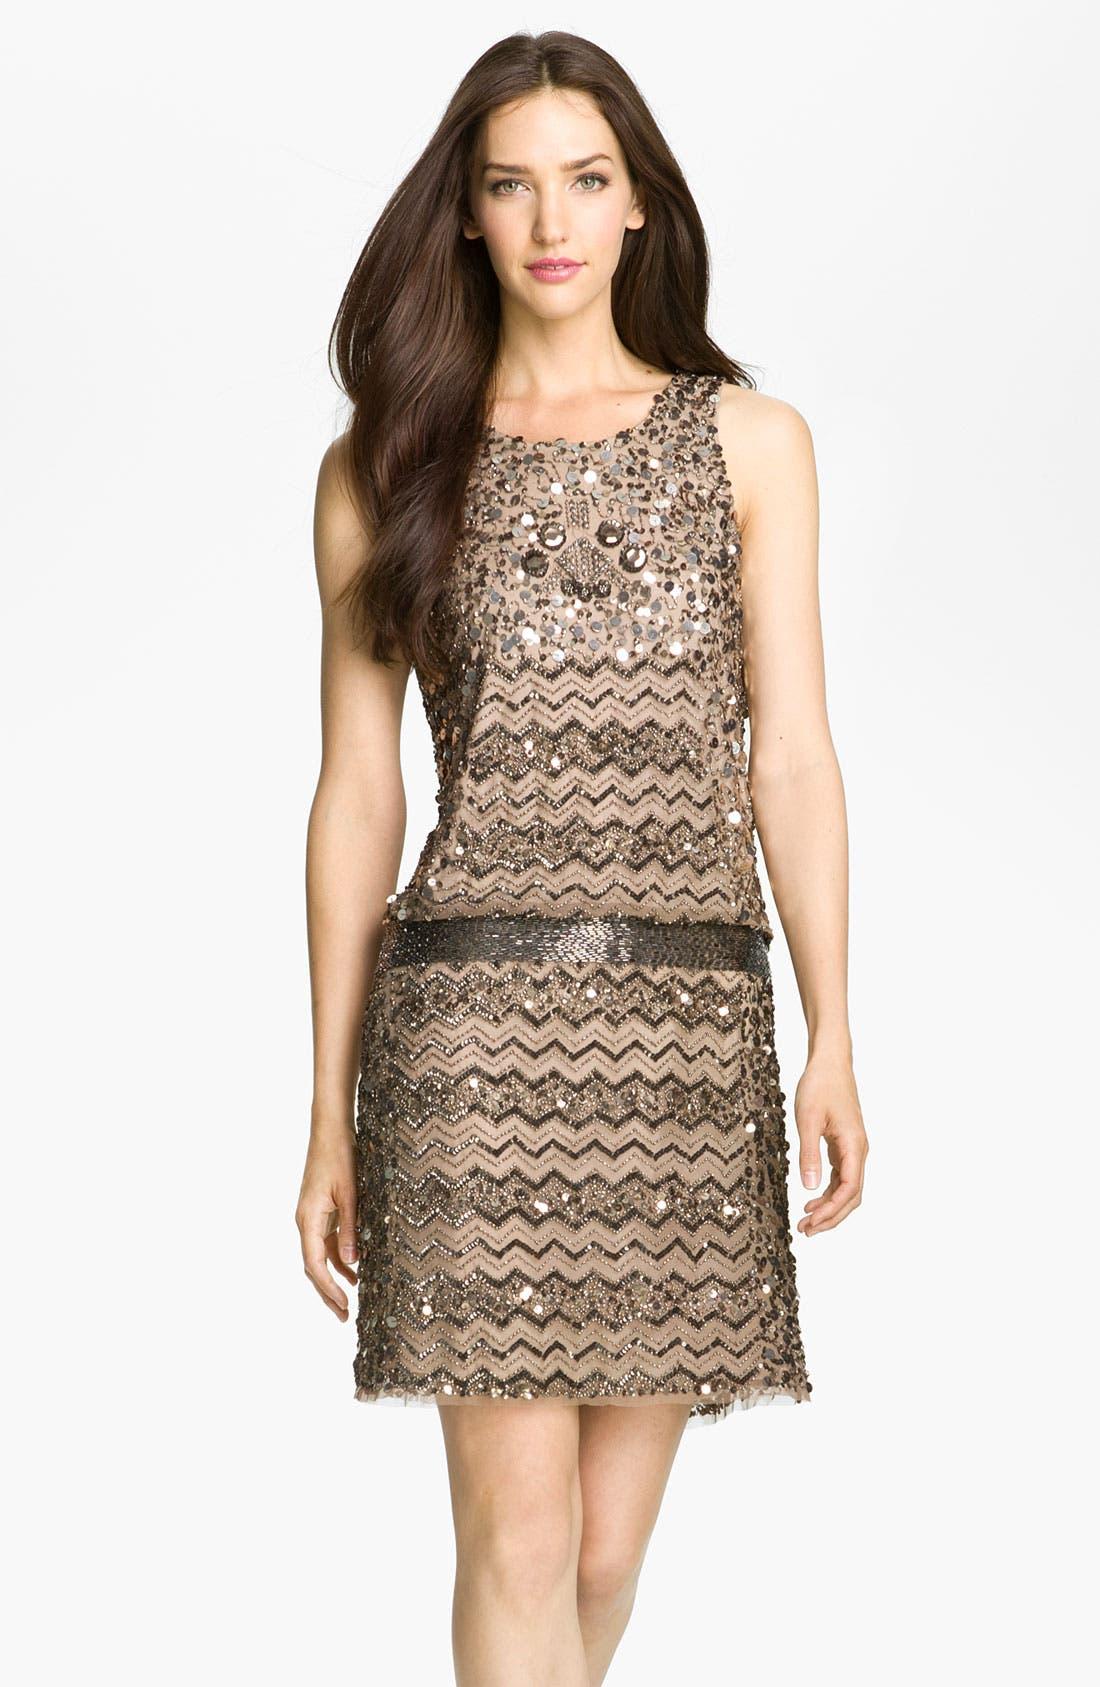 Alternate Image 1 Selected - Adrianna Papell Embellished Zigzag Mesh Dress